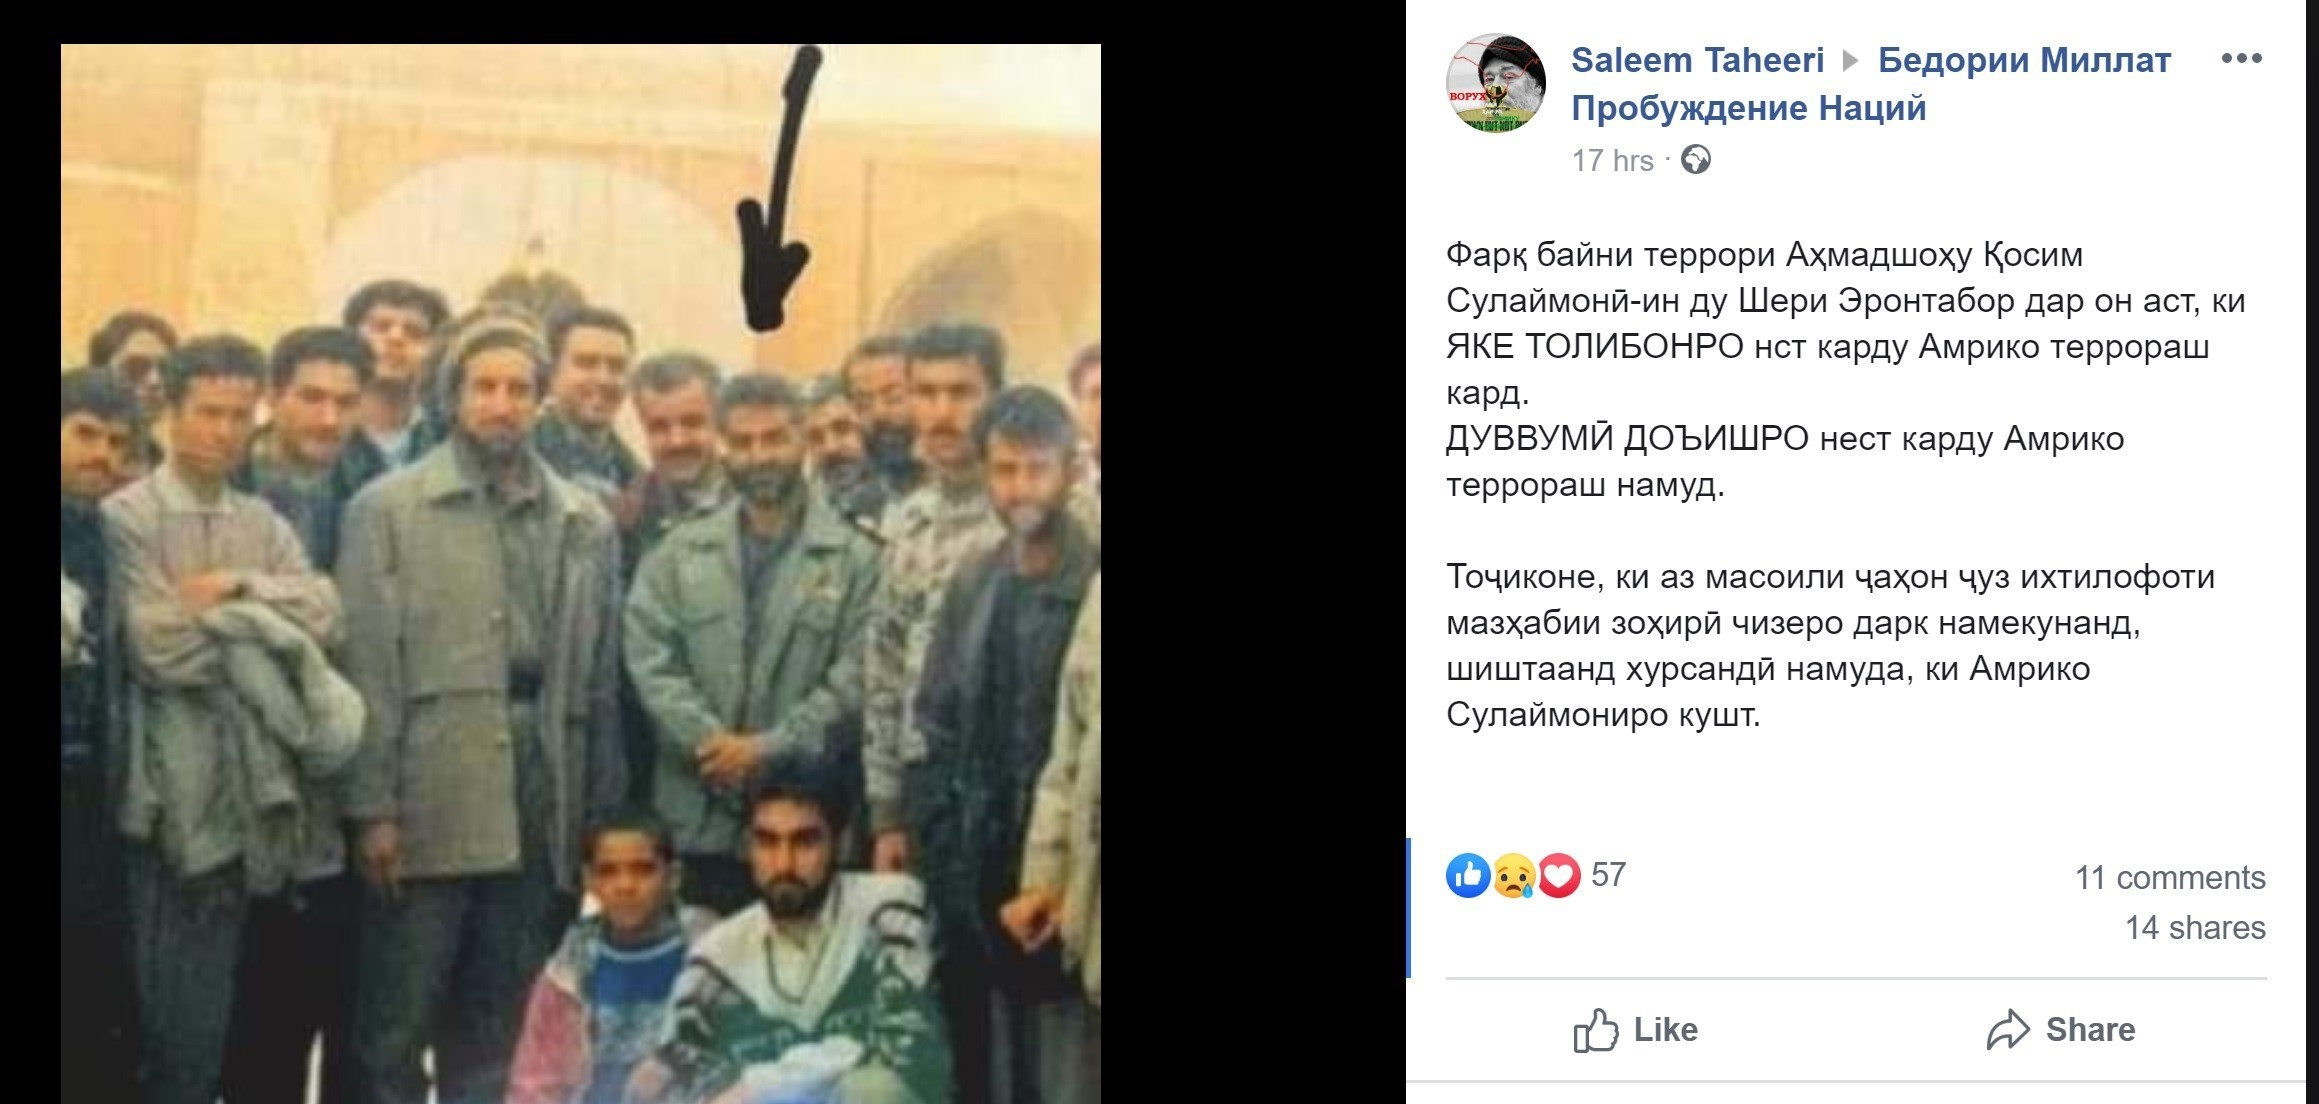 سردار سلیمانی | سردار قاسم سلیمانی , کشور تاجیکستان ,